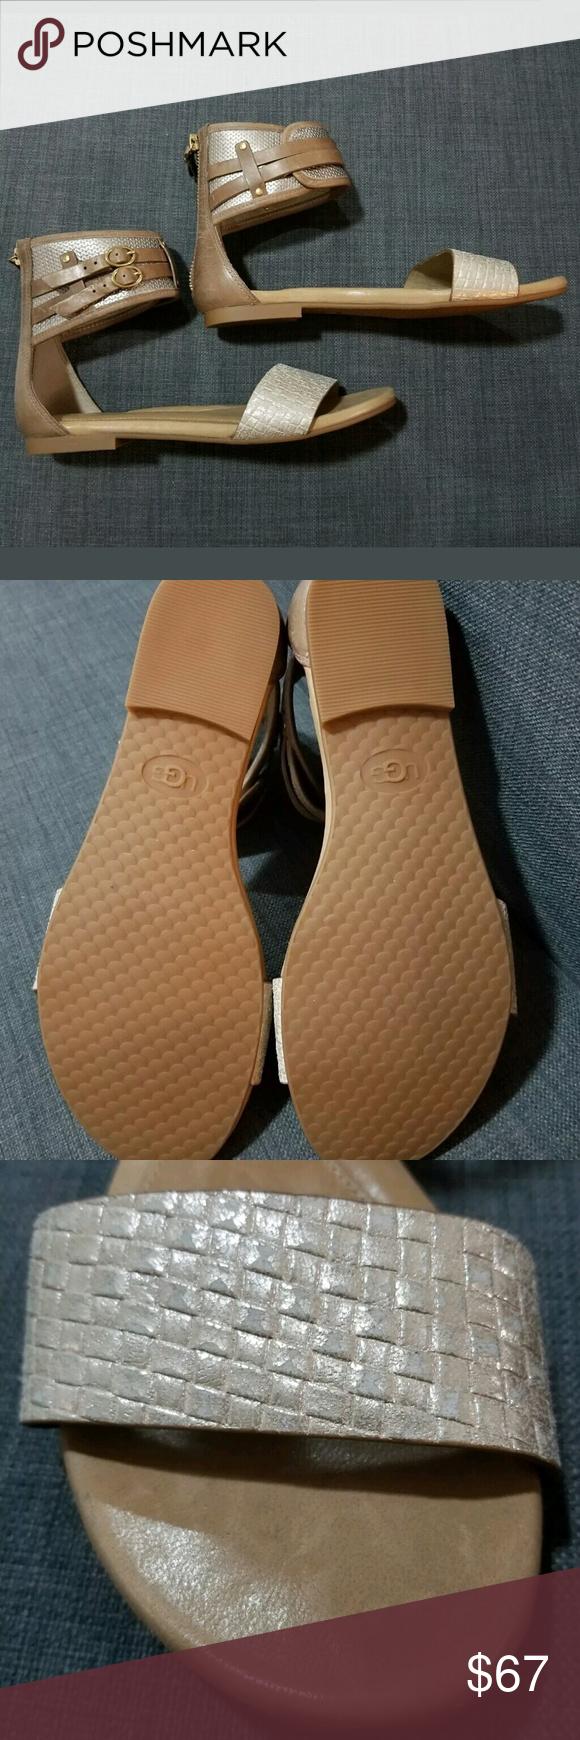 9bdc2738aae6 New UGG Australia SAVANA Metallic Basket SANDALS Brand new UGG Savana  Metallic Basket sandals Size 6